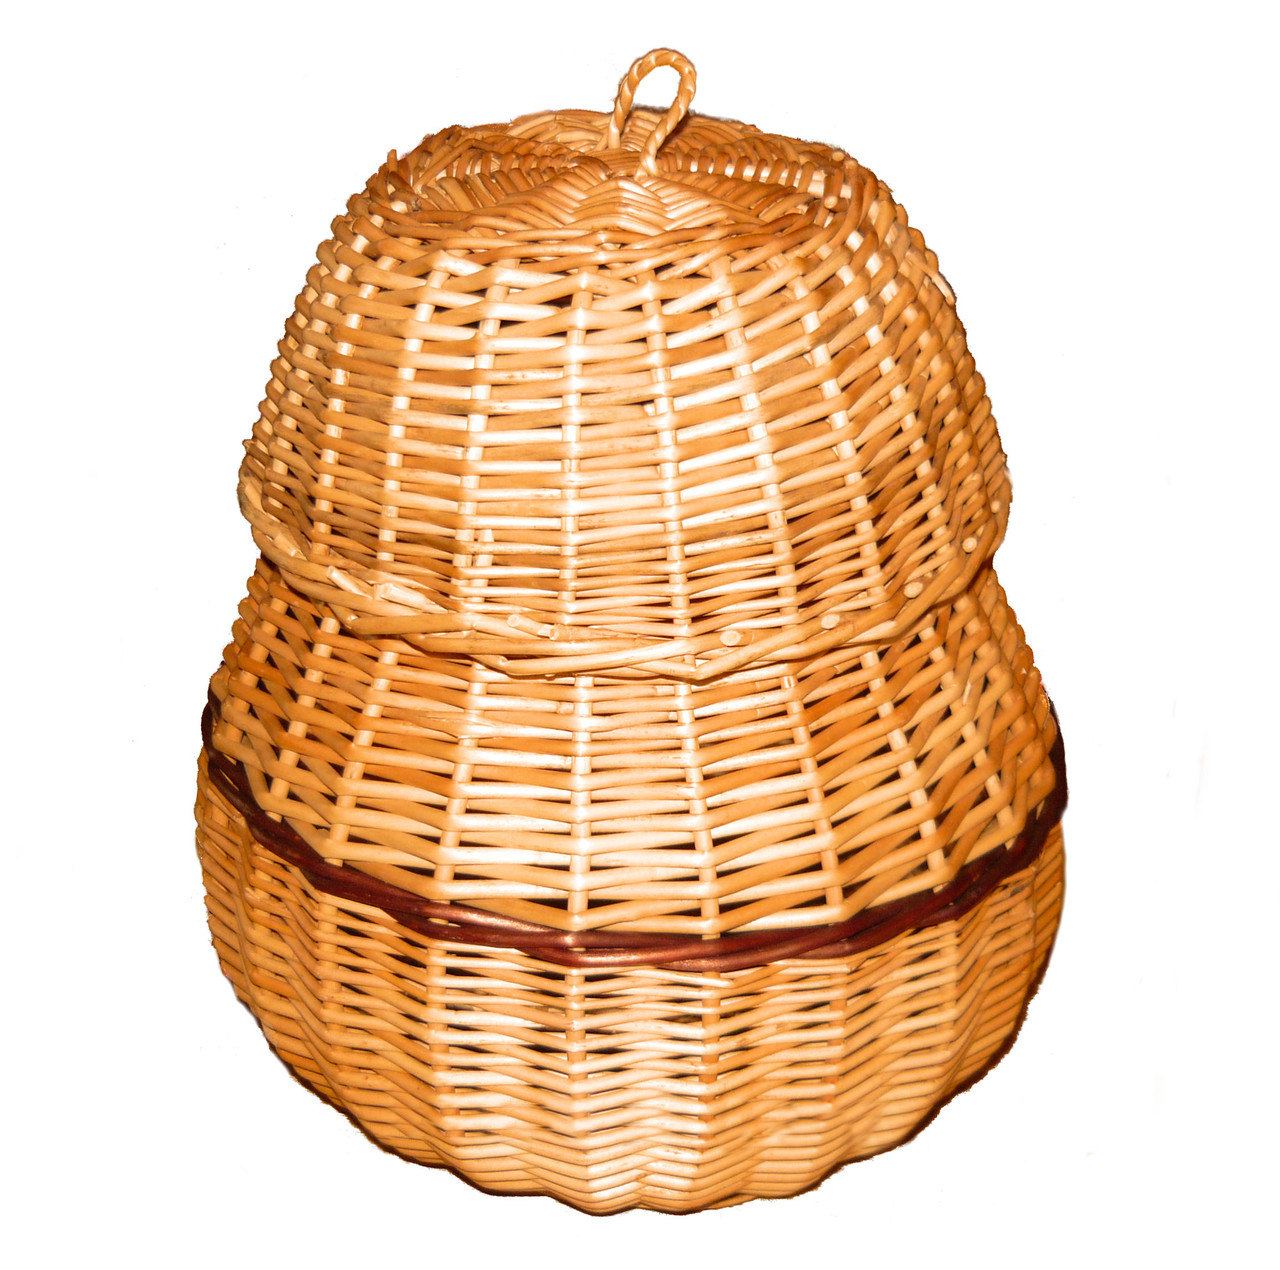 Шкатулка плетеная из лозы